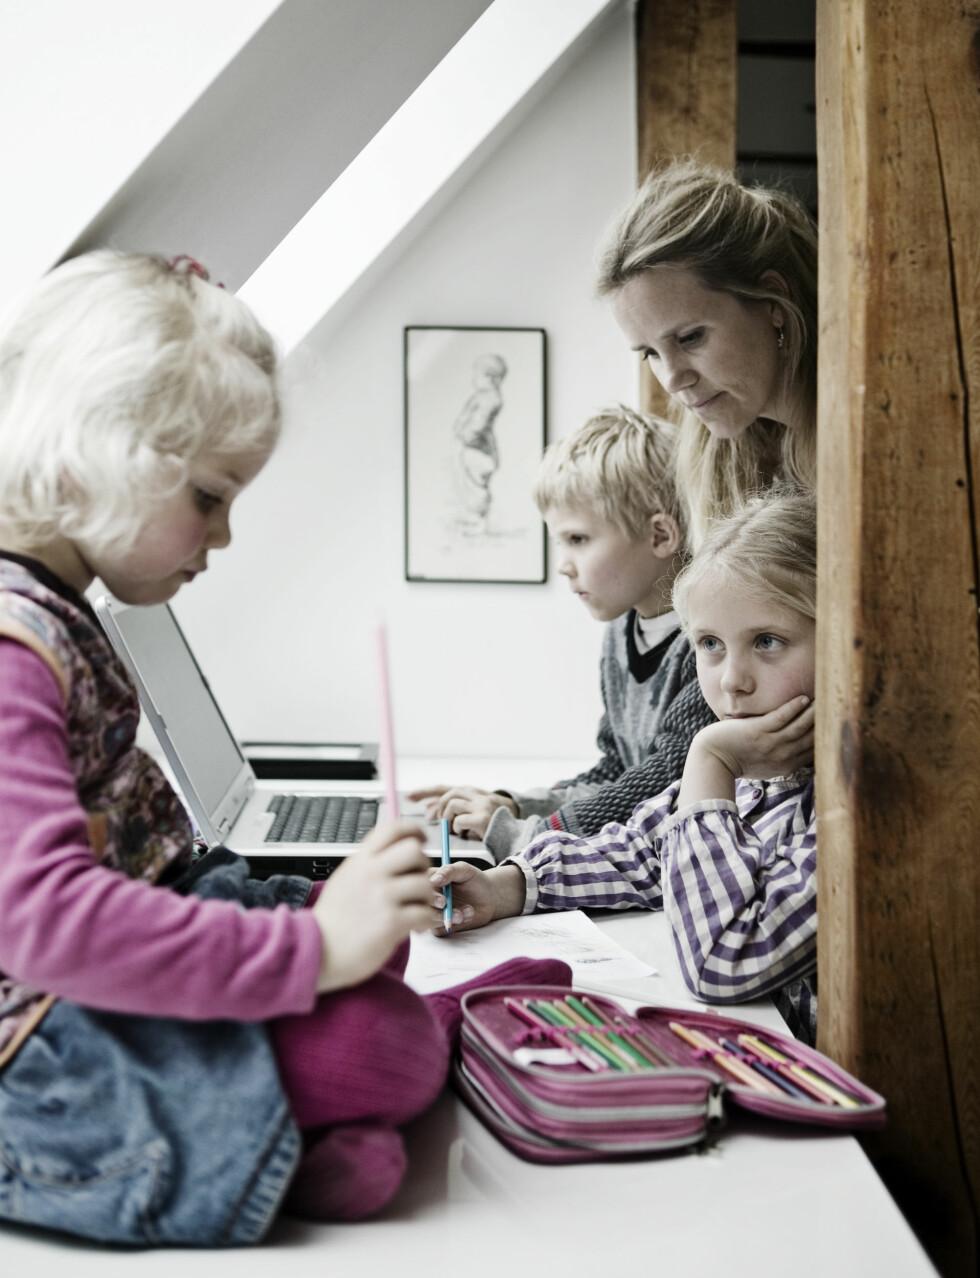 OMBYGGET LÅVE: I en ombygget låve som opprinnelig tilhørte et landsted iKøbenhavn, bor Helen og Ole Berg med Ida, Jens og Ingrid på ni, sju og fem år. Huset er på 250 kvadratmeter fordelt på to etasjer.  Foto: Kira Brandt/House of Pictures